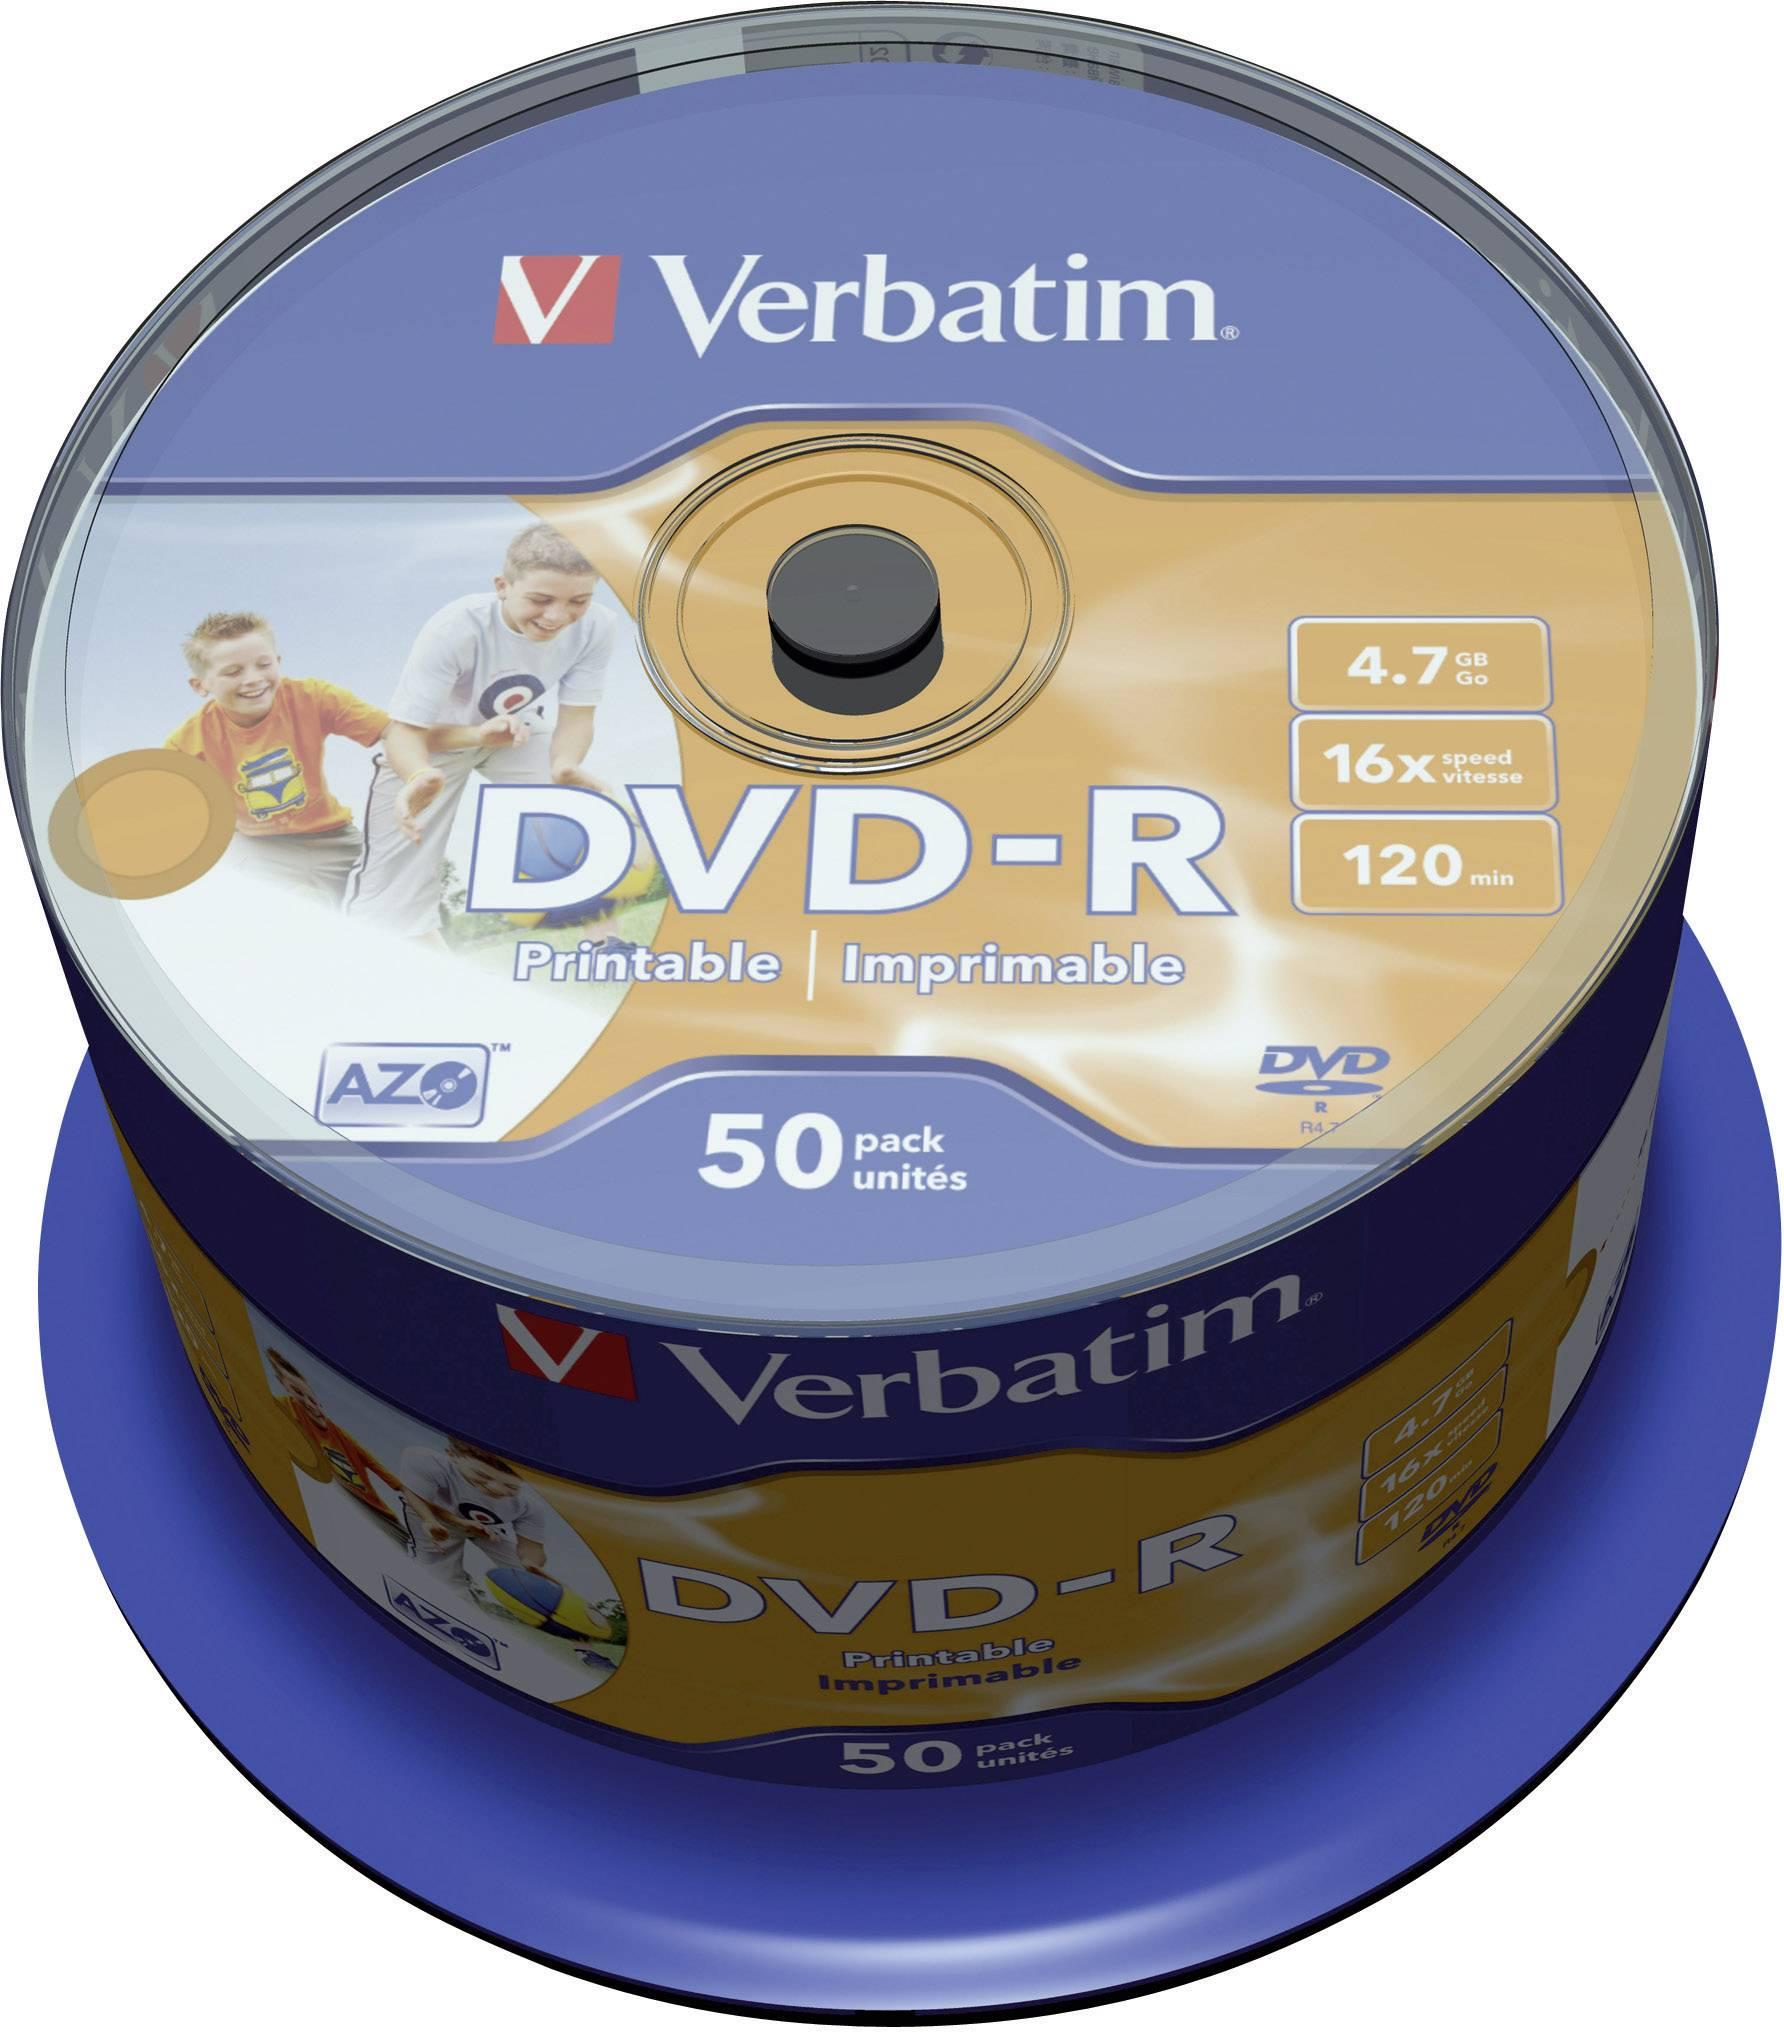 DVD-R 4.7 GB Verbatim 43533, možnosť potlače, 50 ks, vreteno